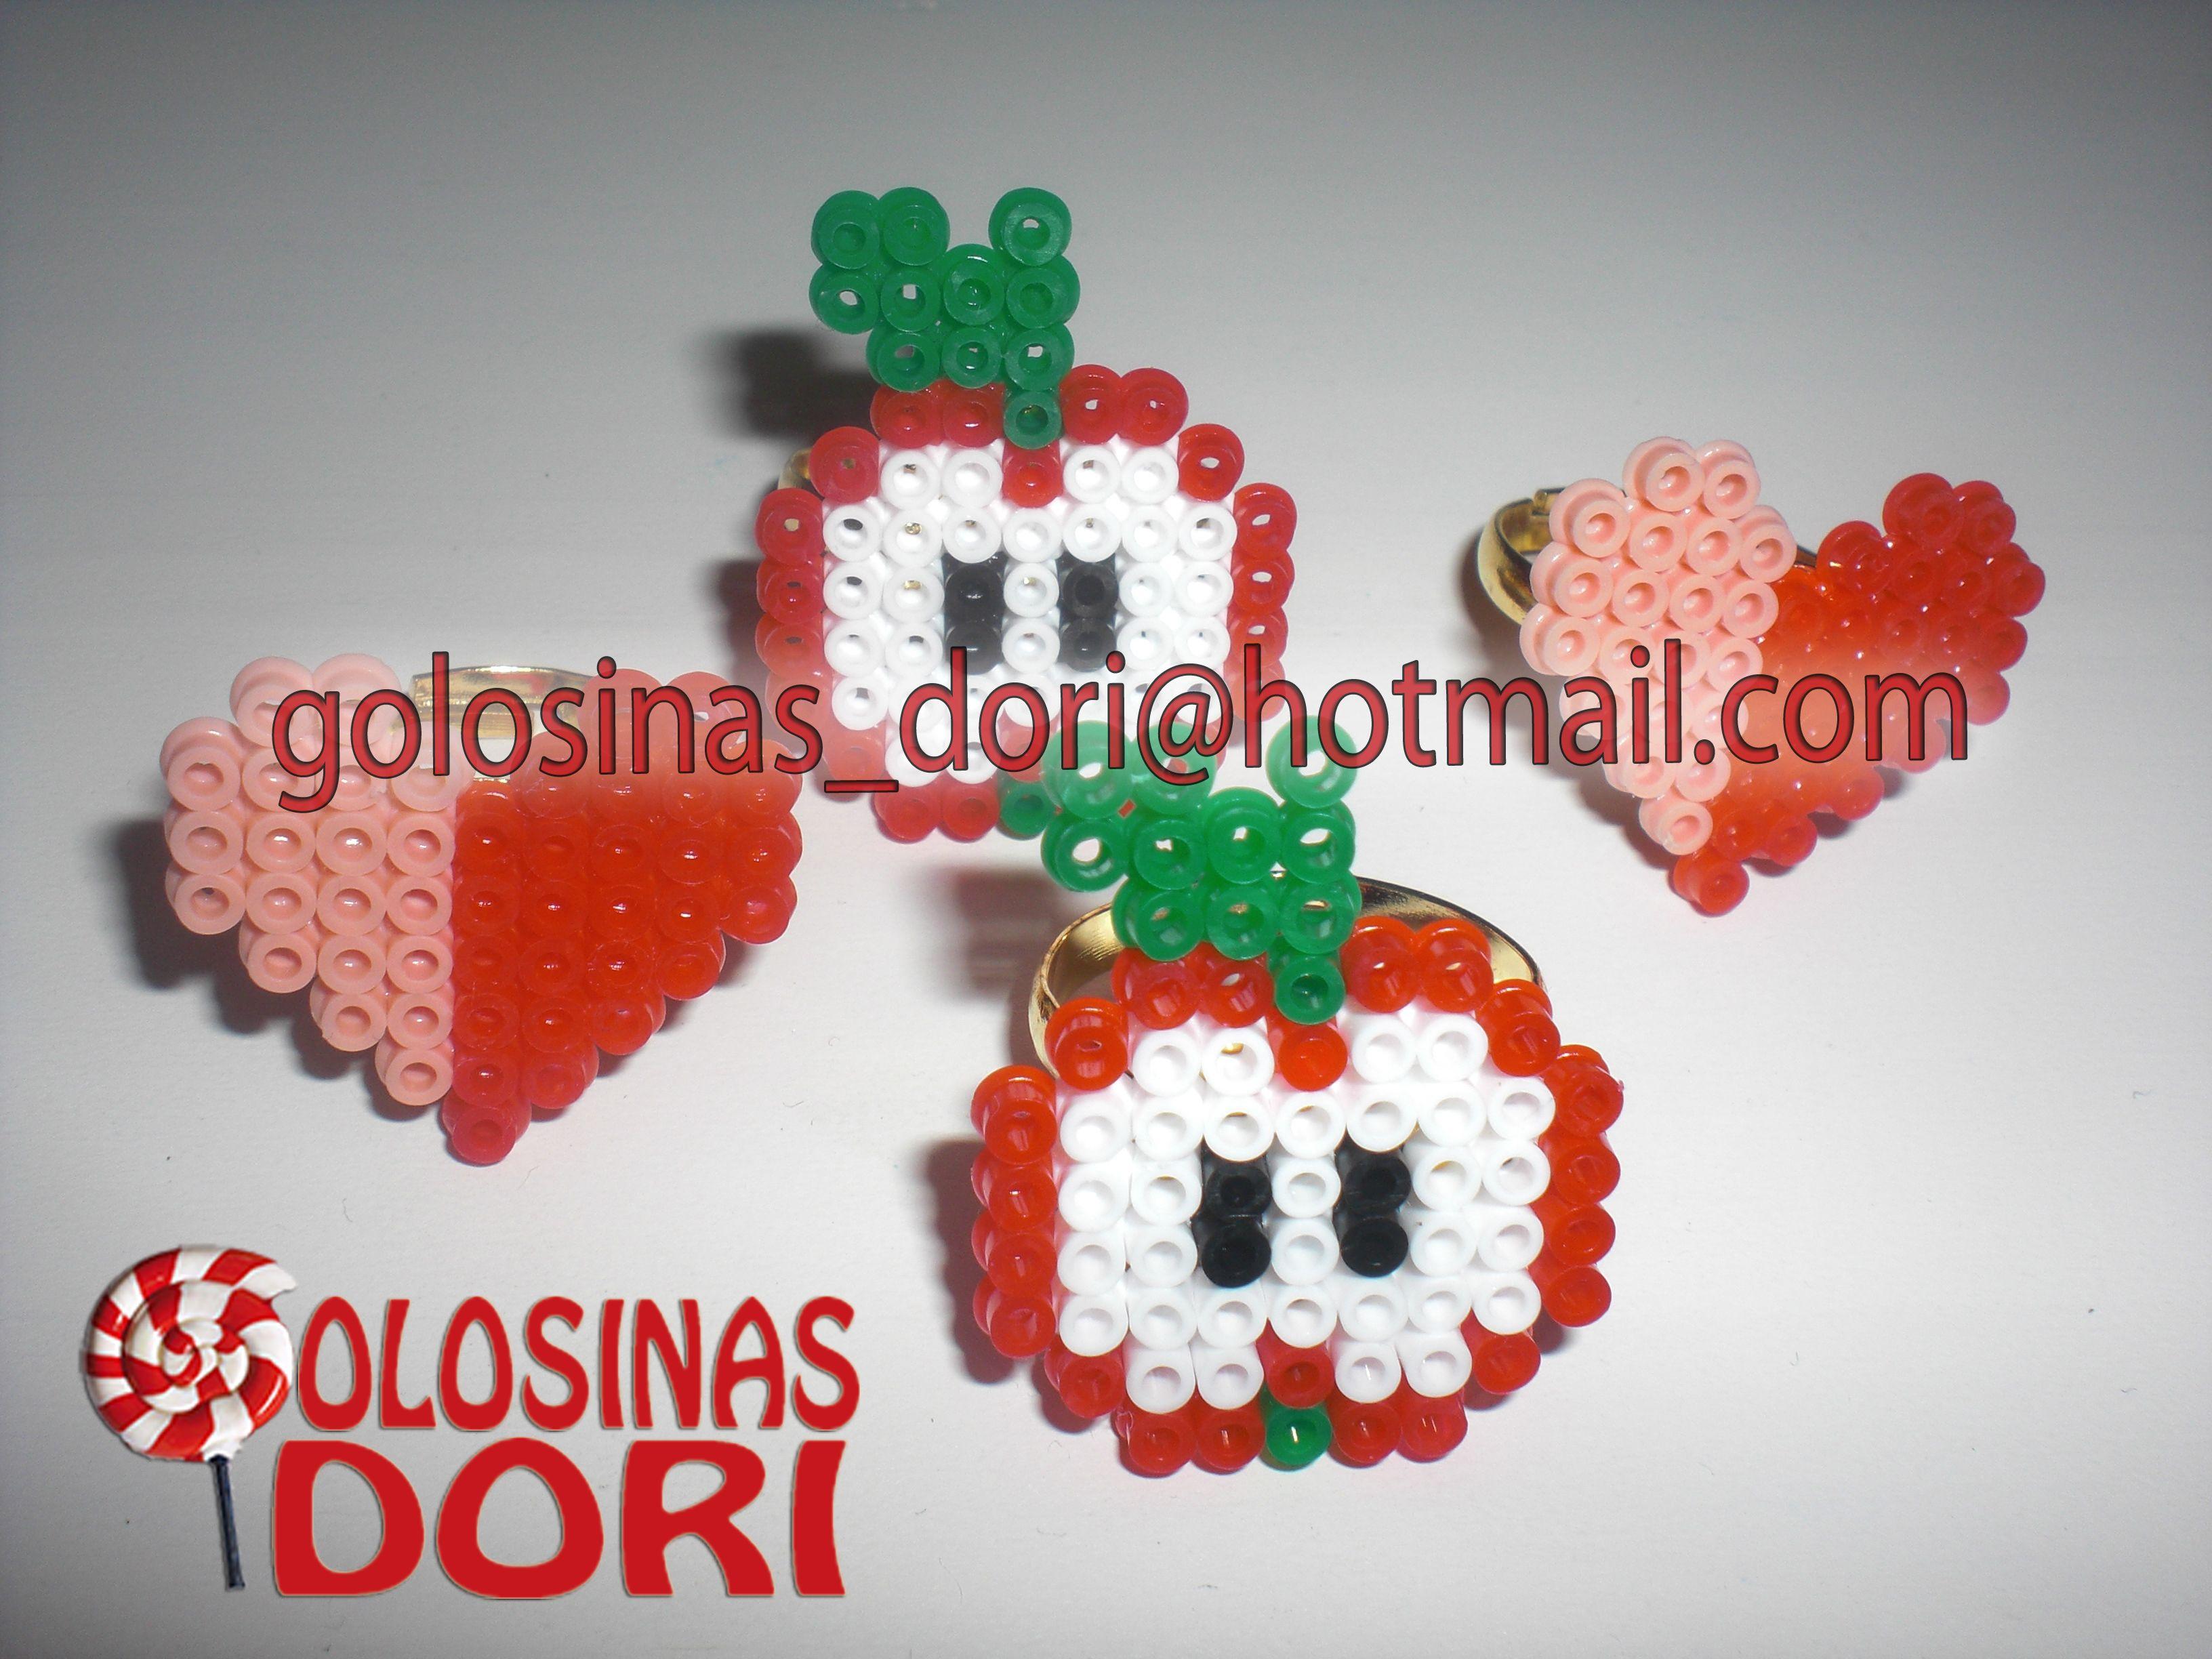 Anillos Hama Beads - 1,50€/und   Haz tu pedido en golosinas_dori@hotmail.com